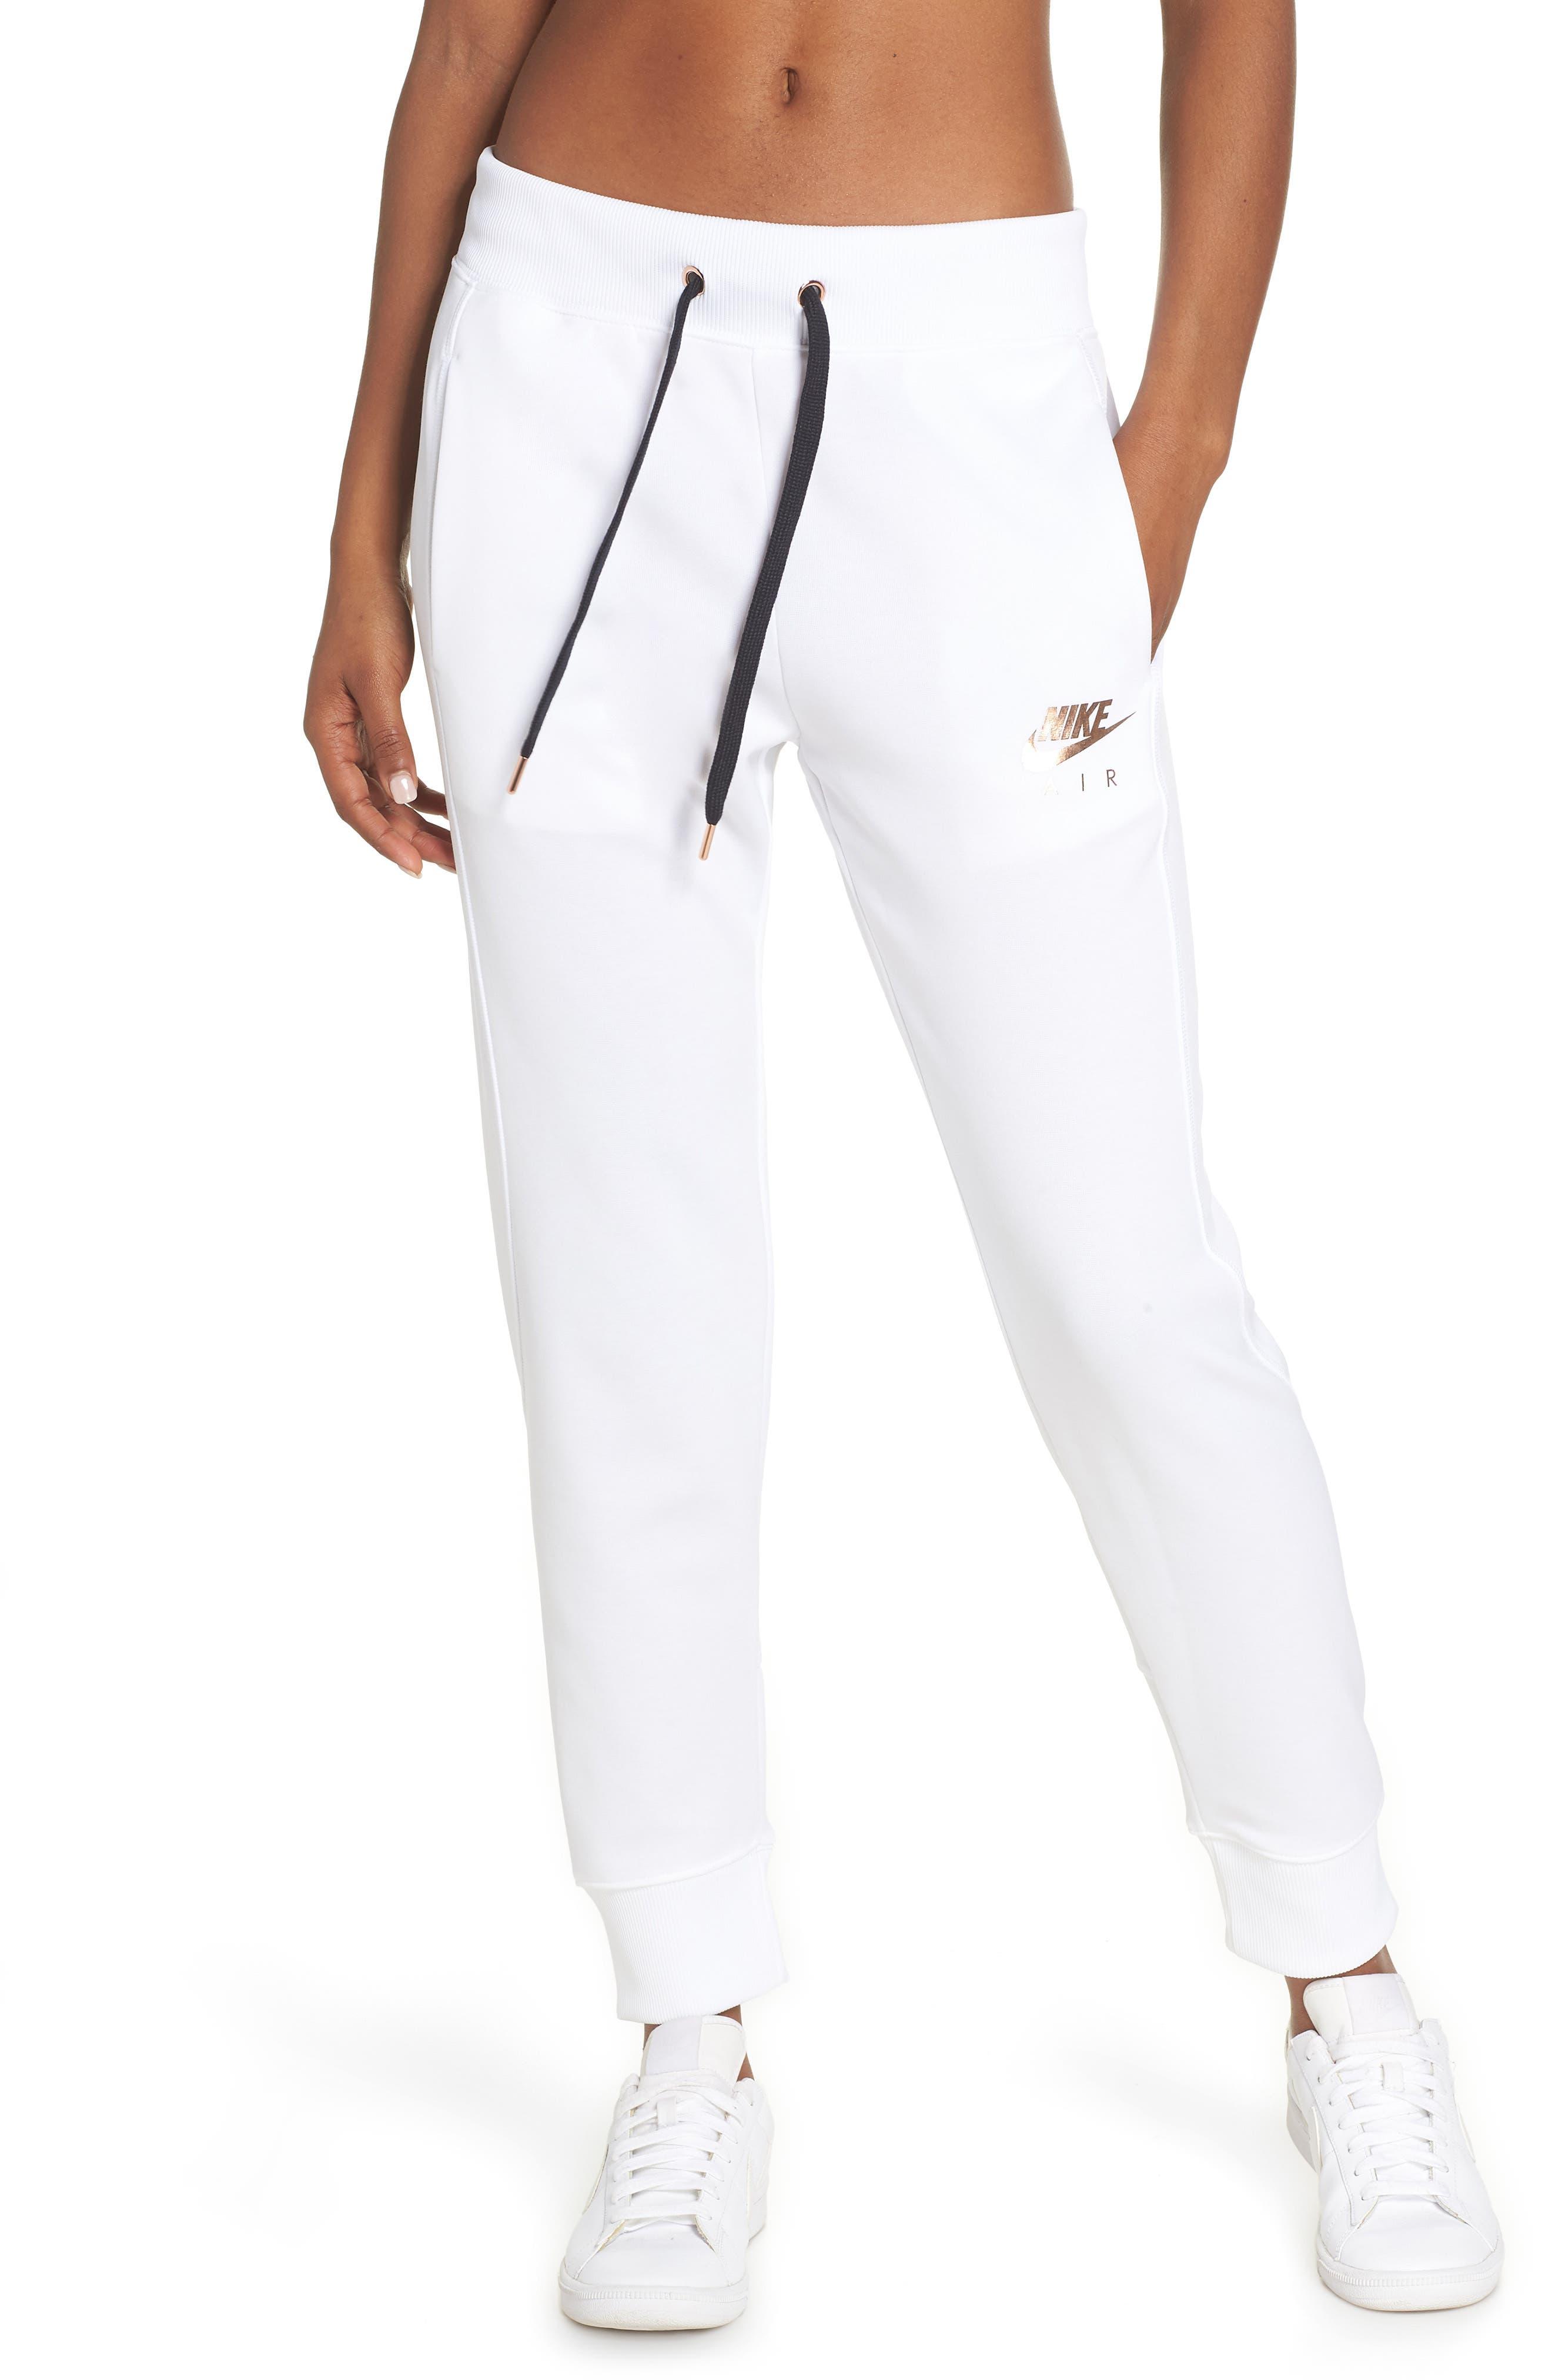 Sportswear Air Jogger Pants,                             Main thumbnail 1, color,                             WHITE/ ROSE GOLD/ BLACK